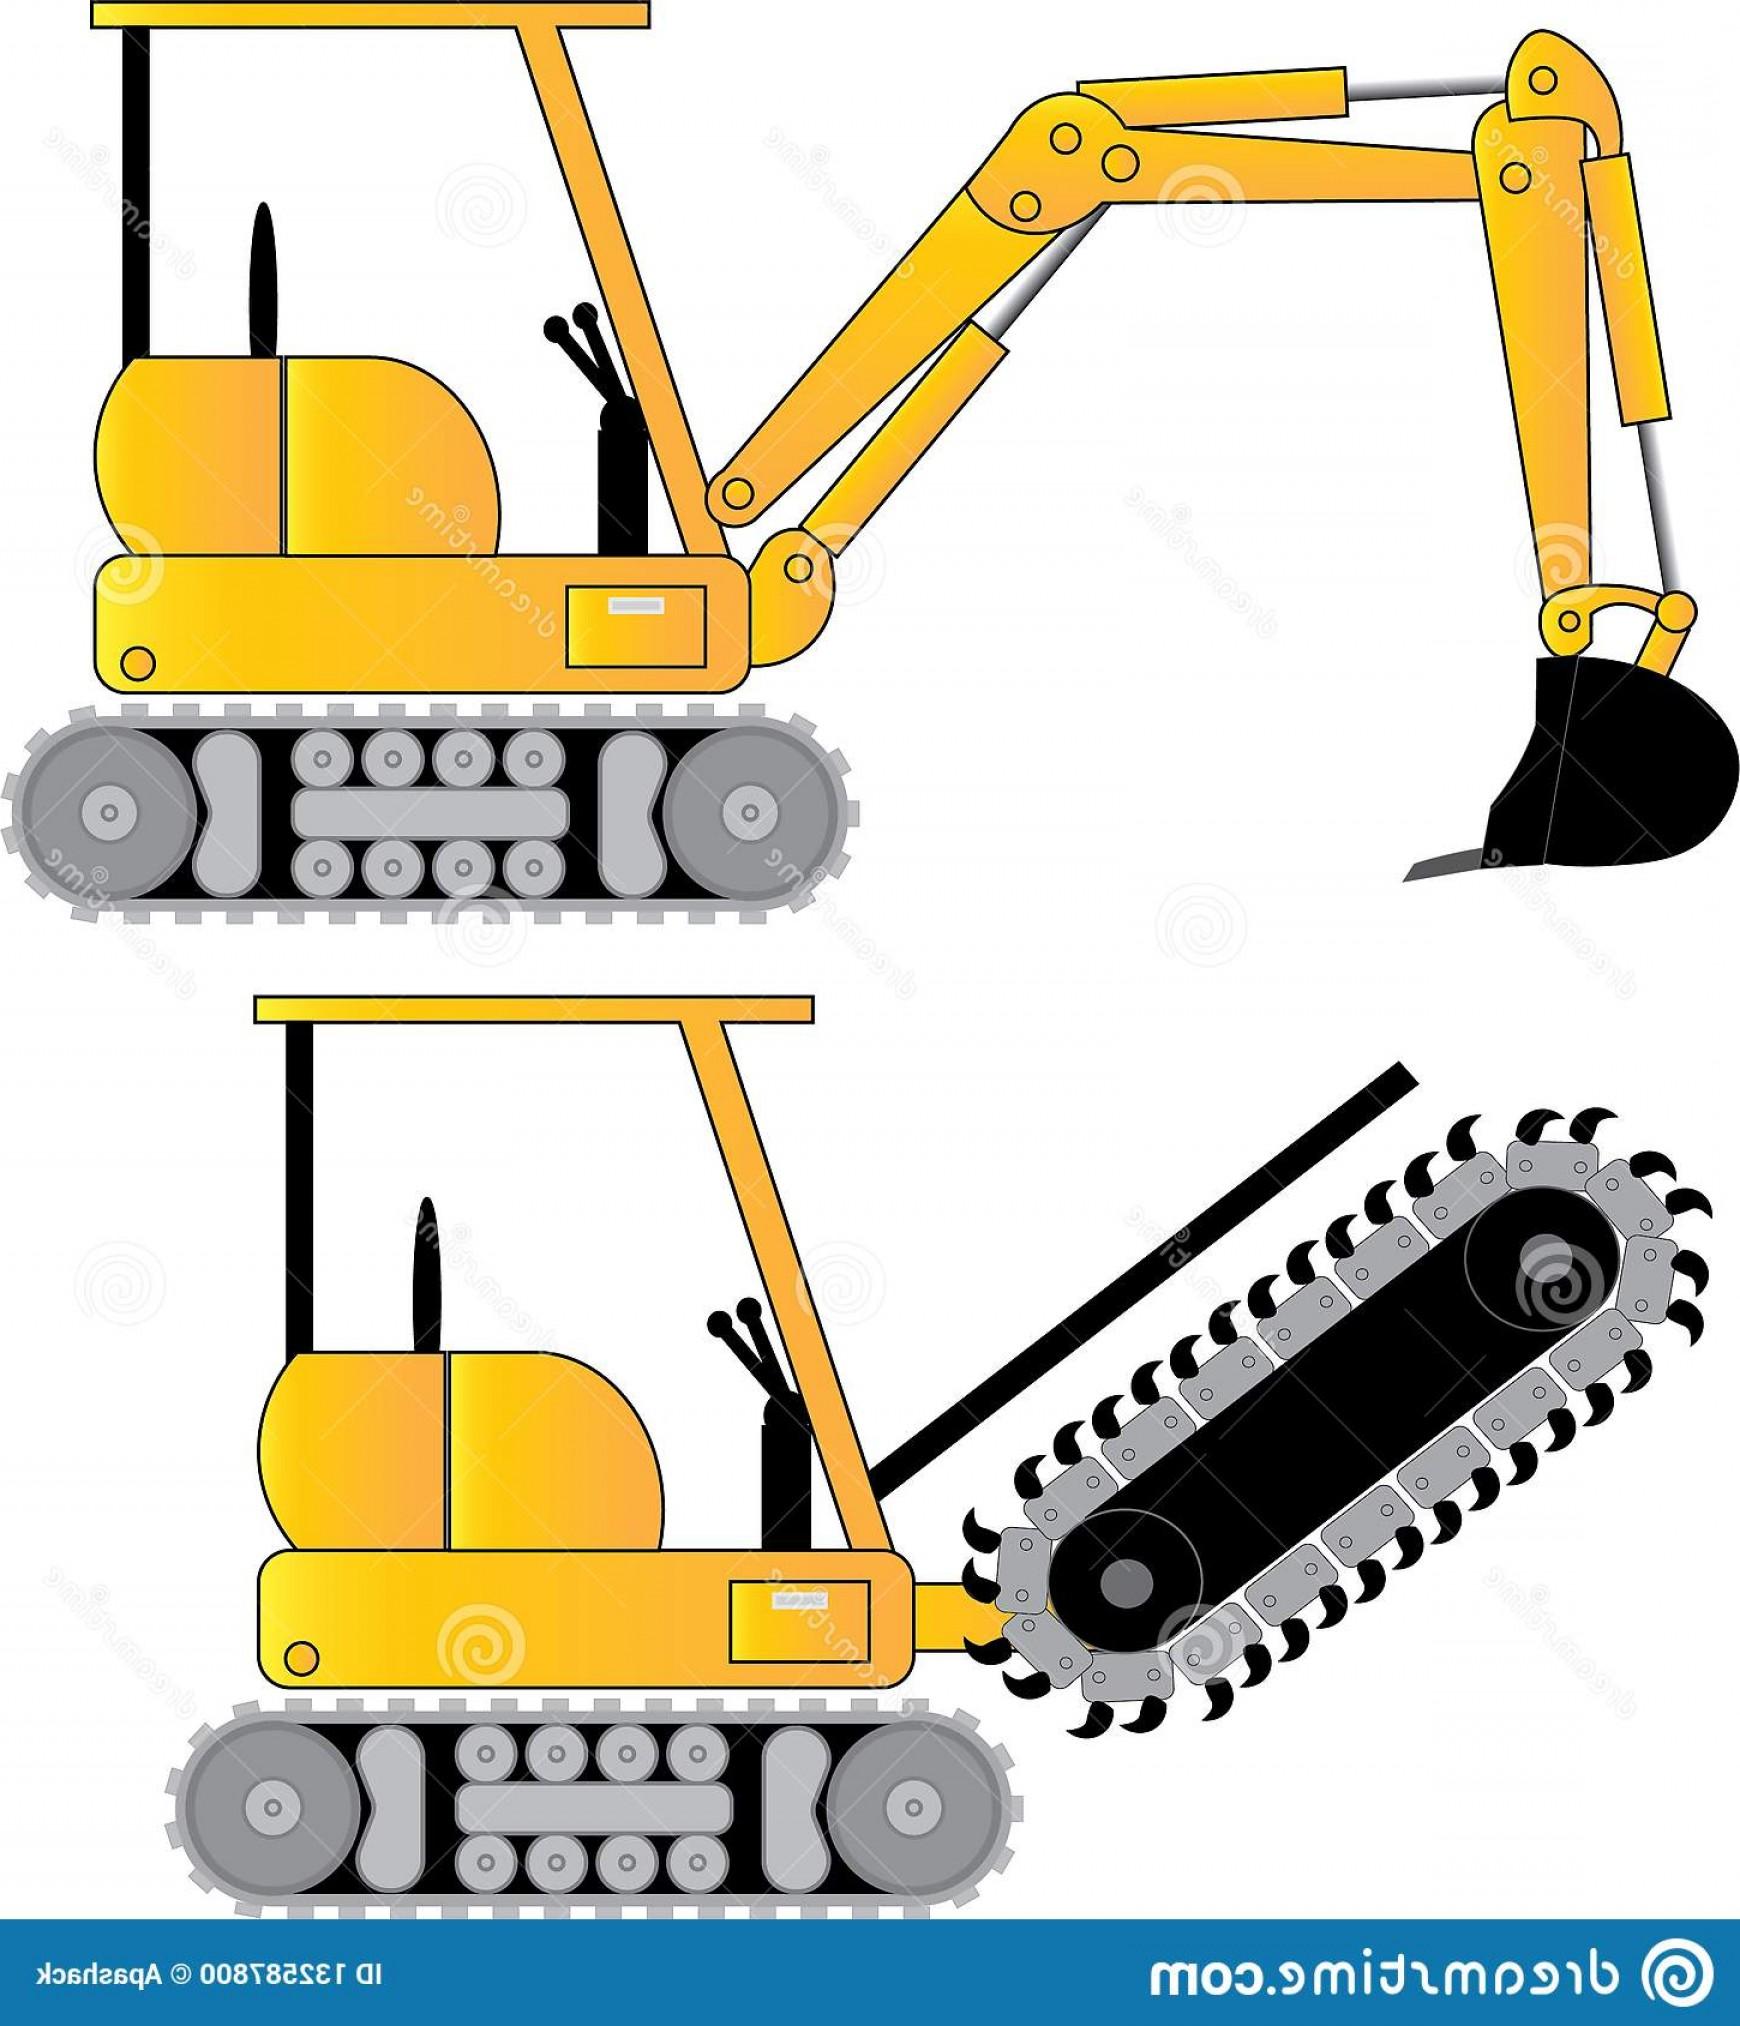 Small track hoe excavator. Backhoe clipart trackhoe